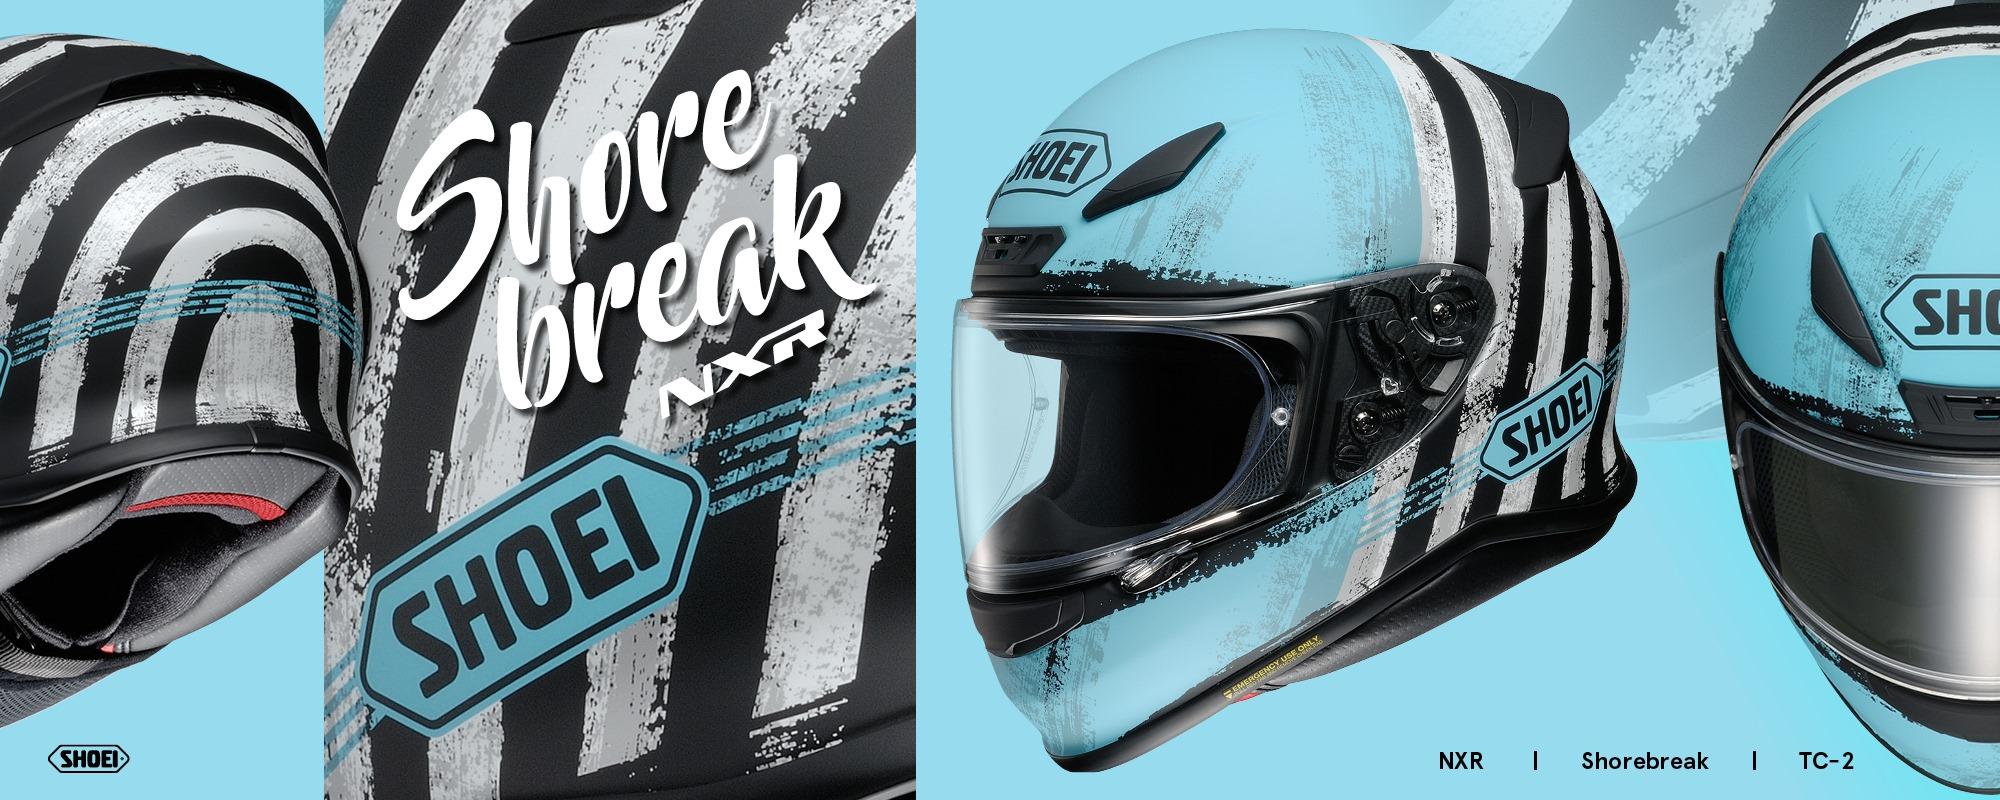 nxr-shorebreak